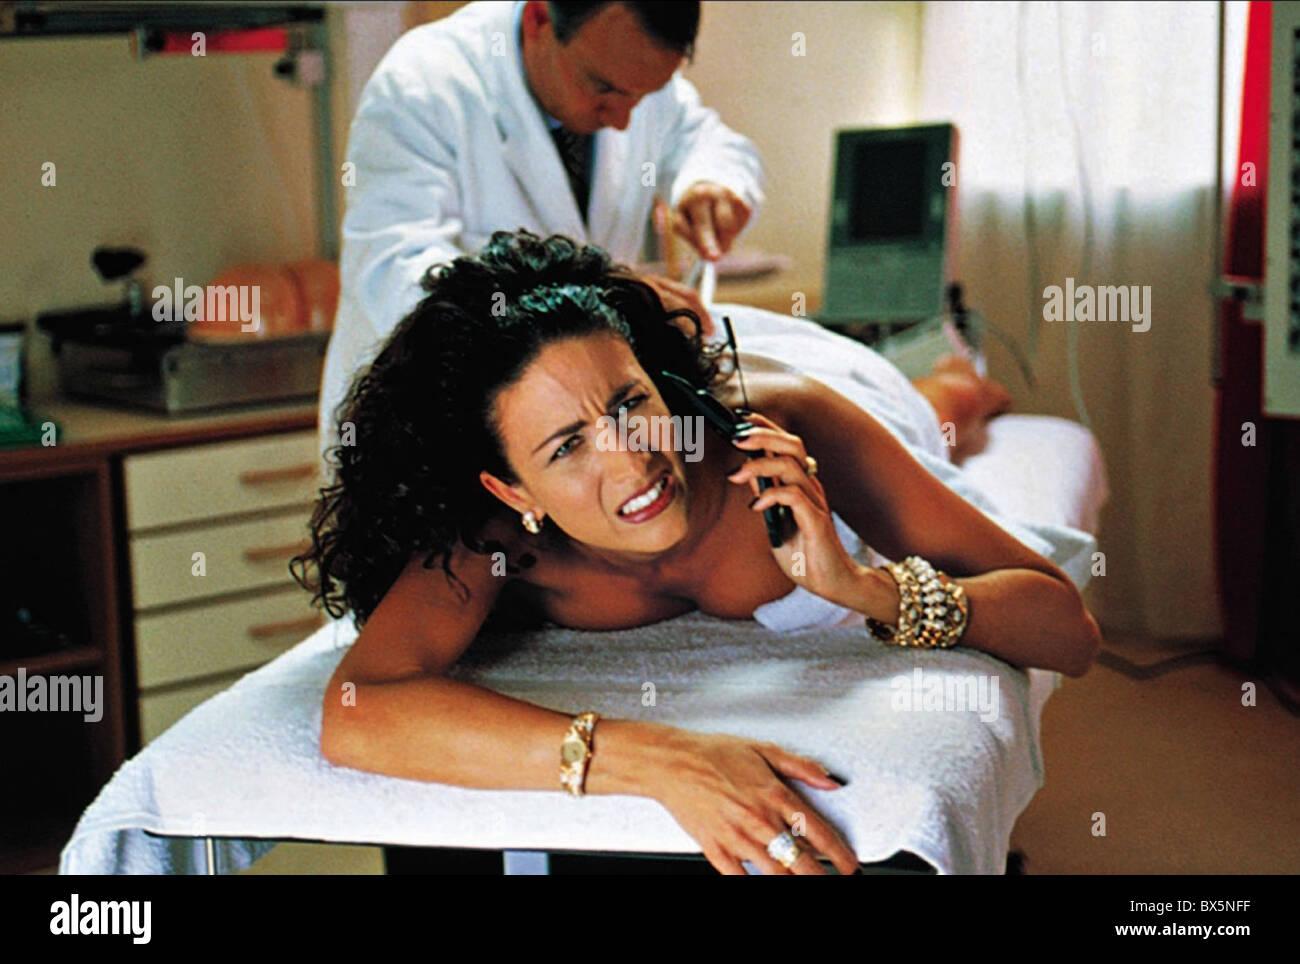 RANDI INGERMAN SVITATI (1999) - Stock Image